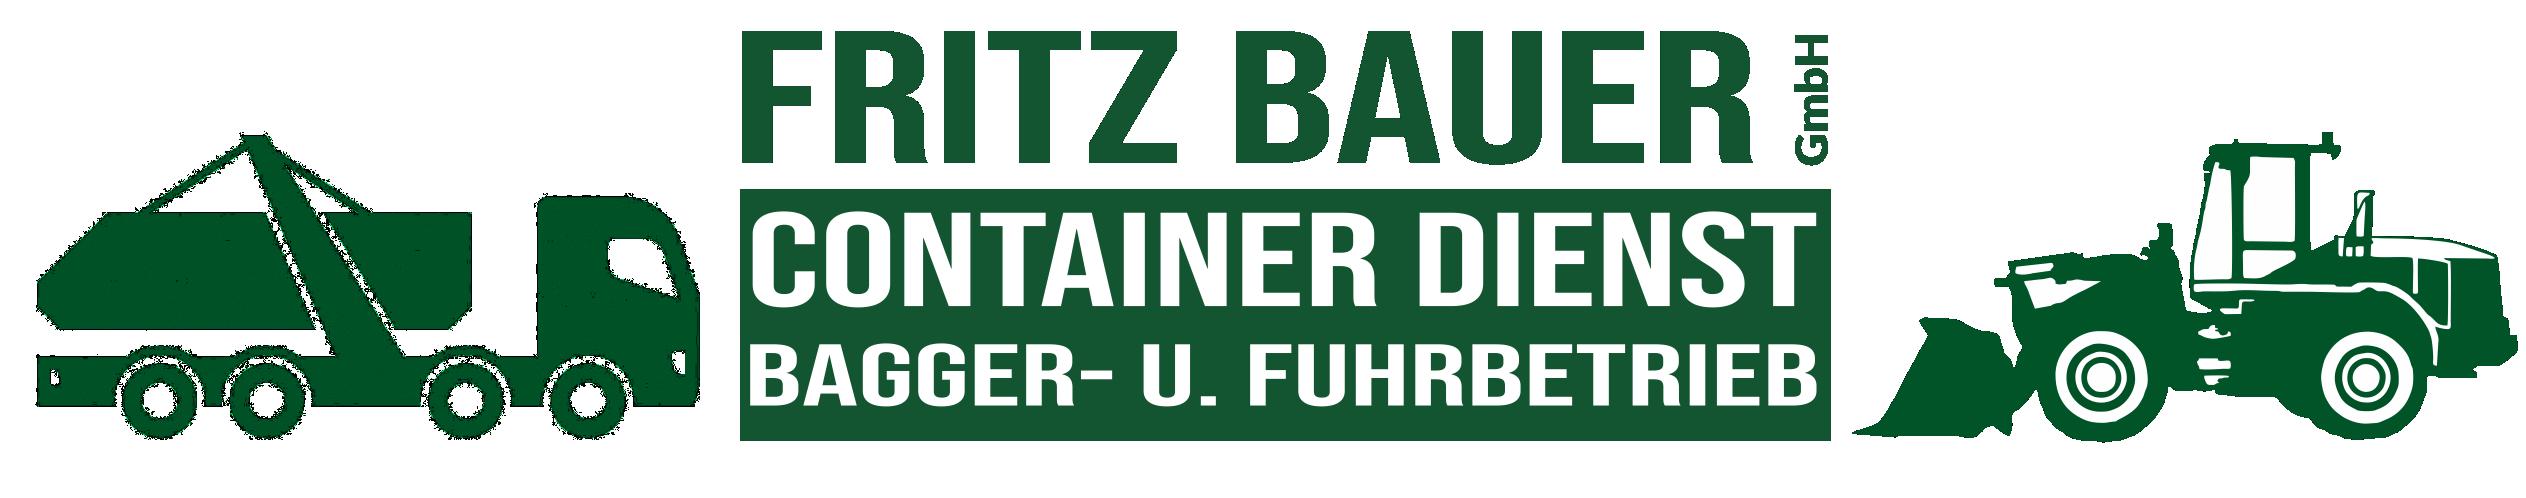 https://www.fritzbauer.de